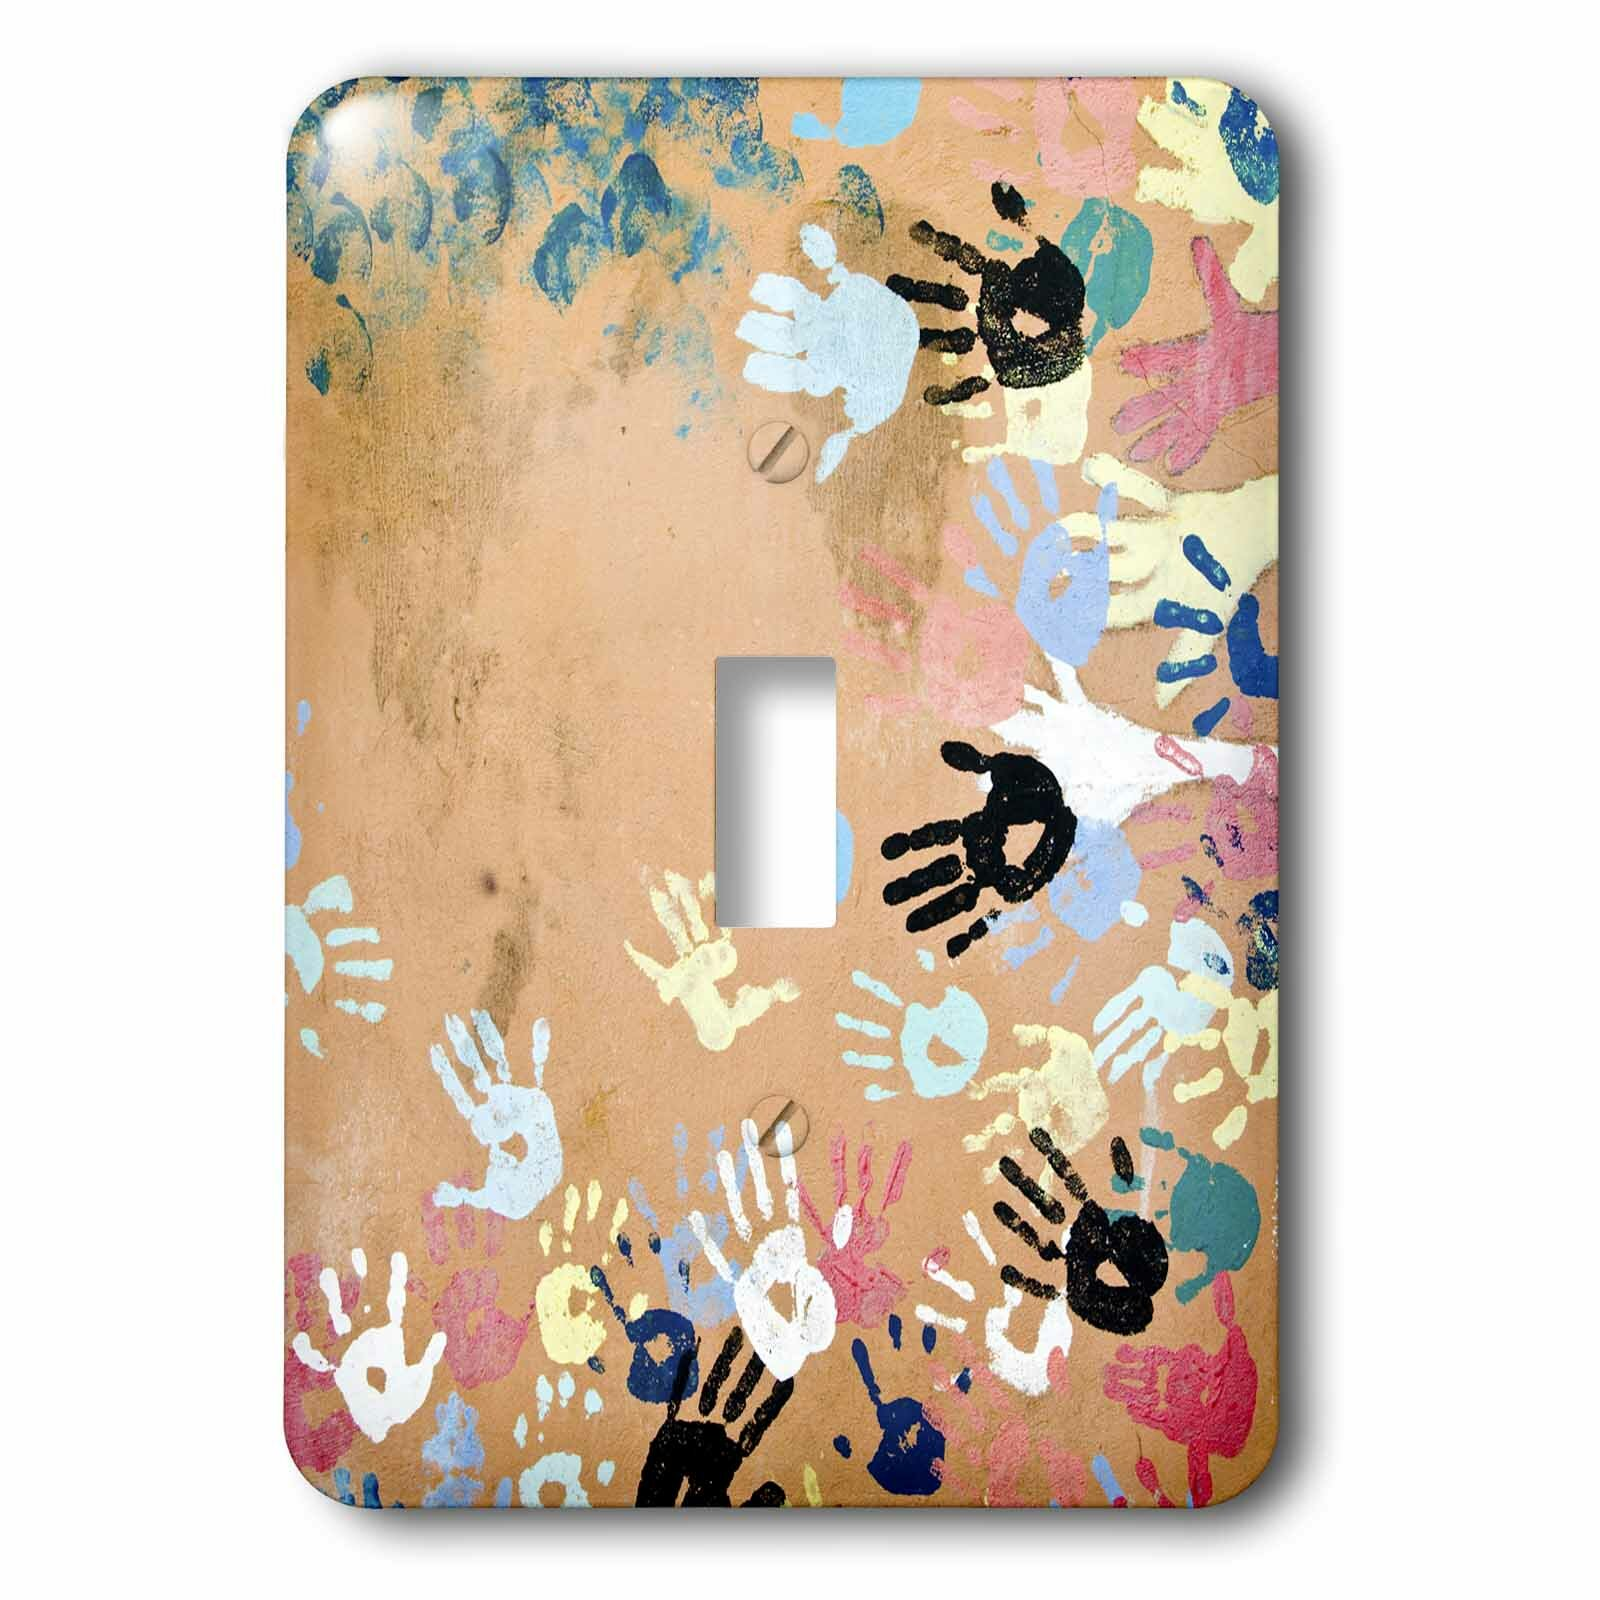 3drose Belgium Liege Mural Painting Hands 1 Gang Toggle Light Switch Wall Plate Wayfair